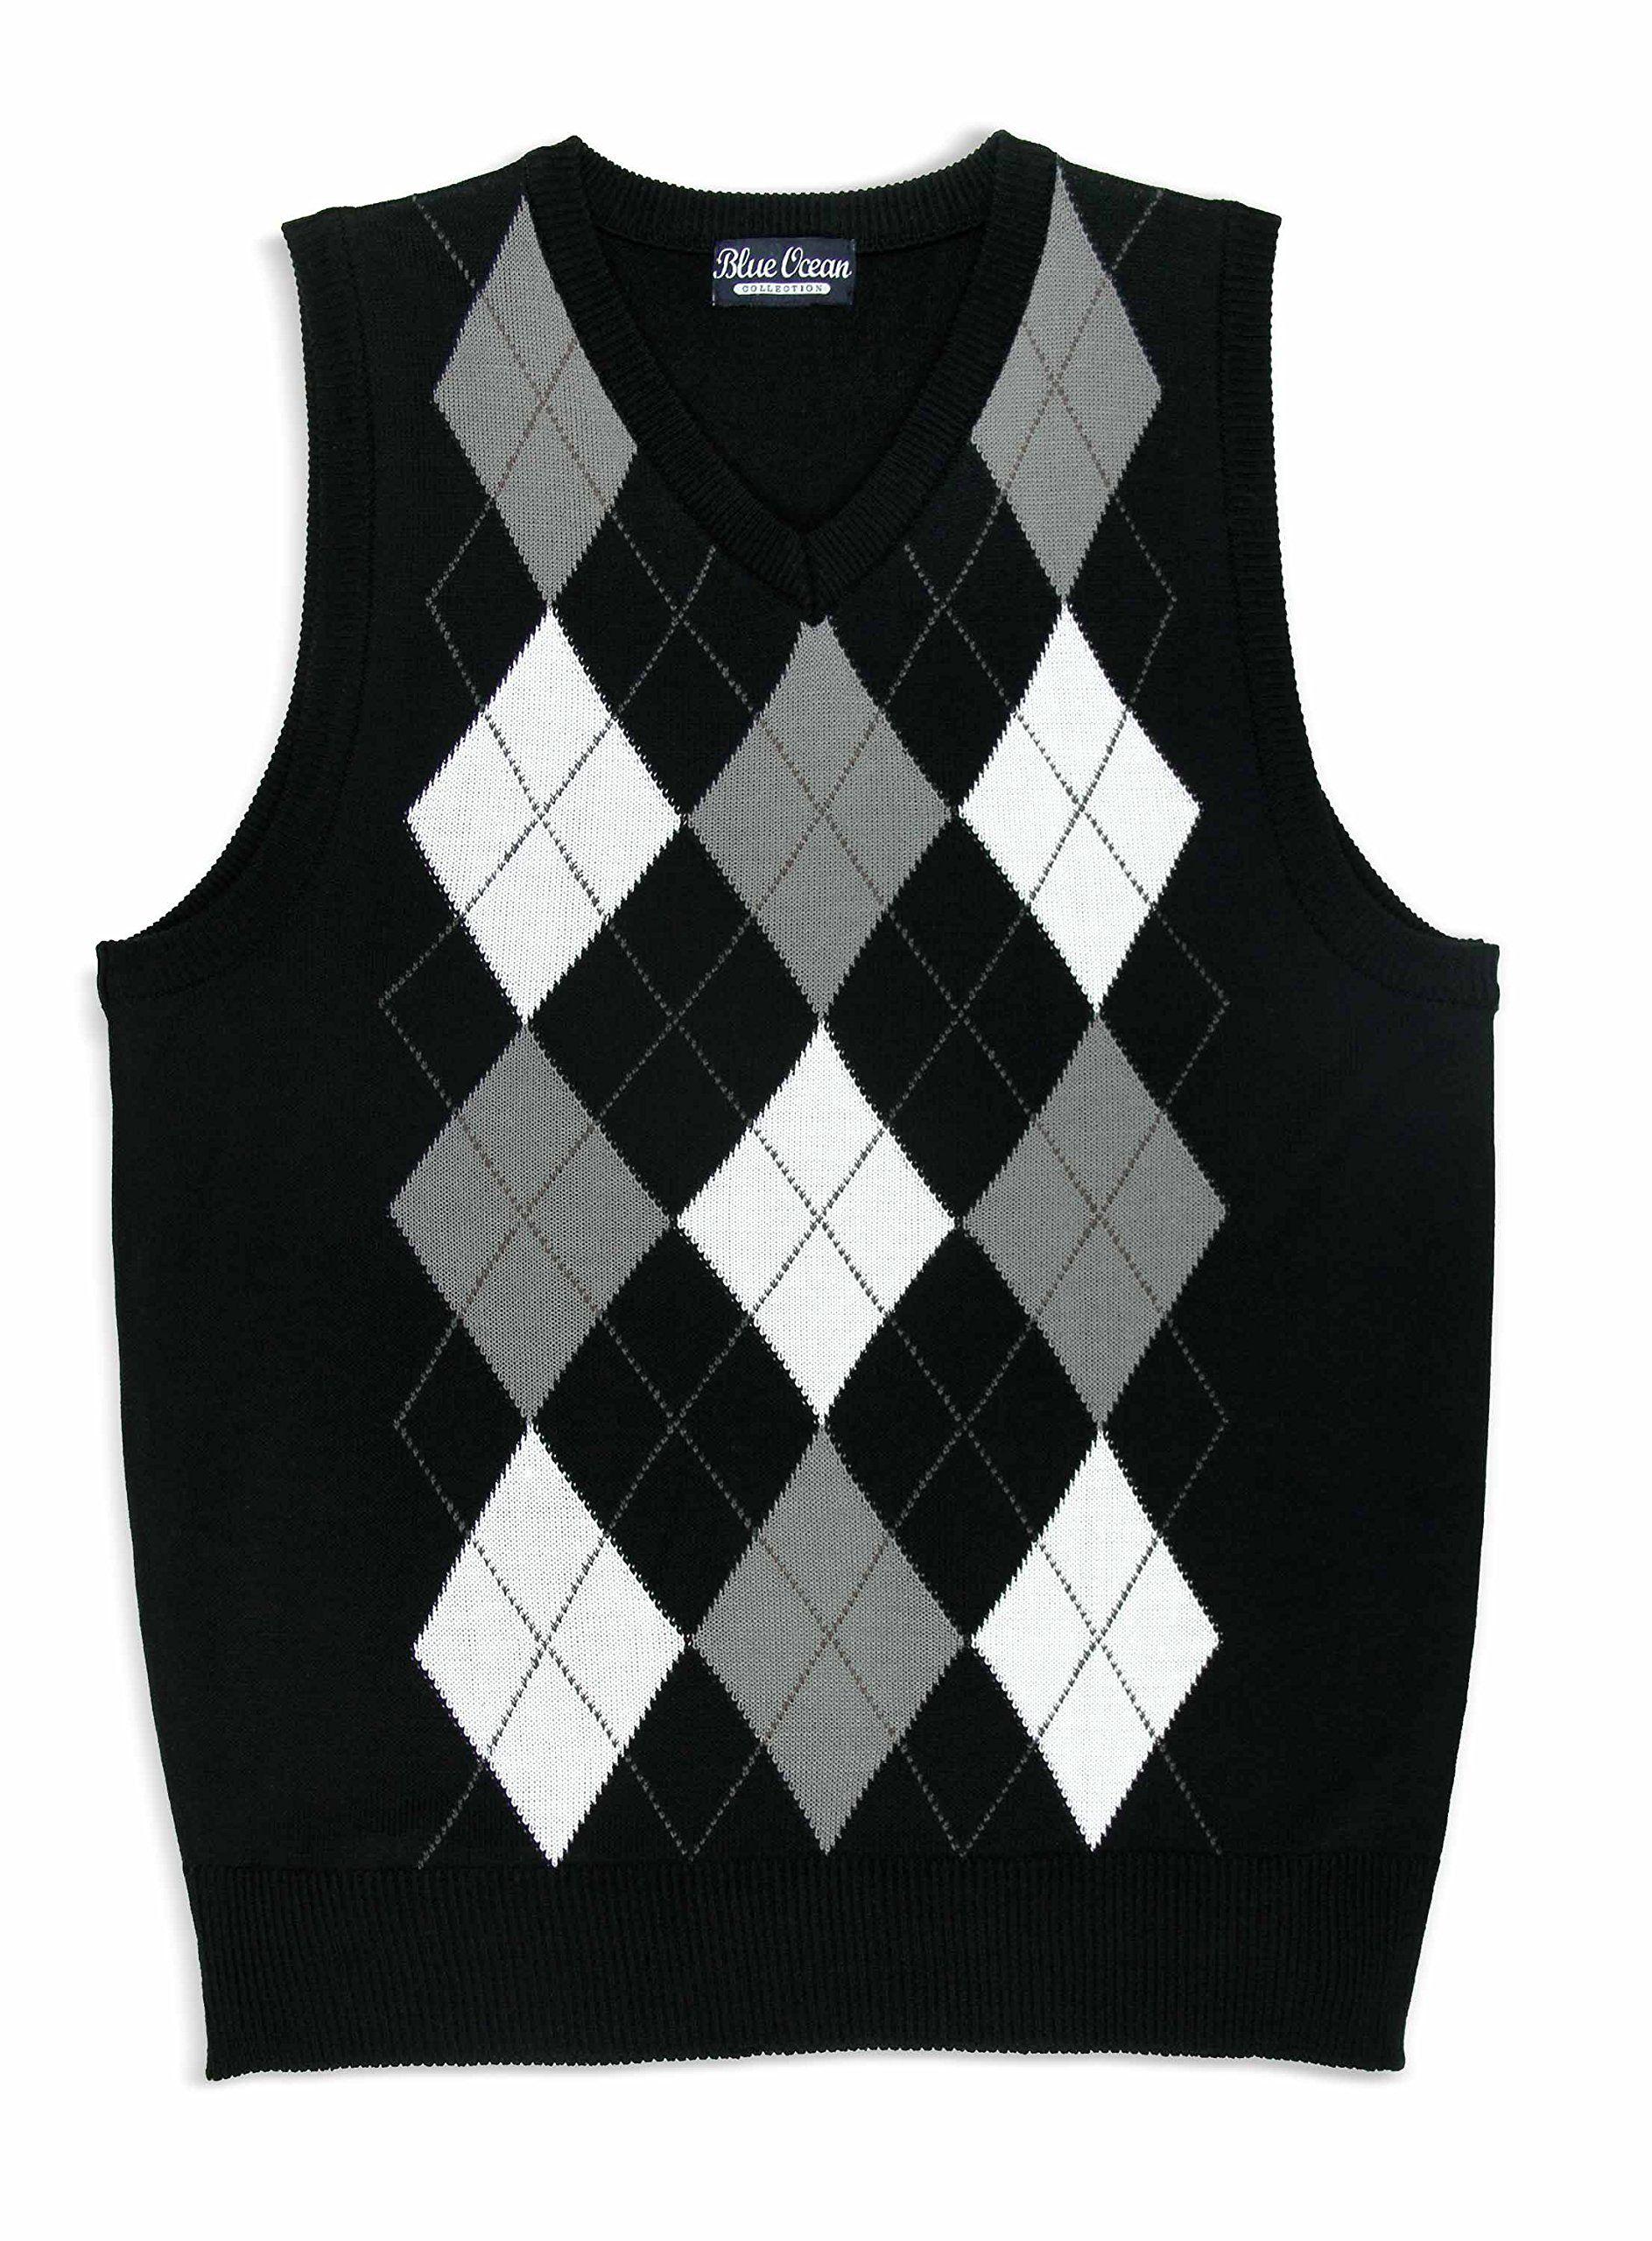 Boy's Argyle Sweater Vest SV-255BOYS (12-14/Medium, Black ...